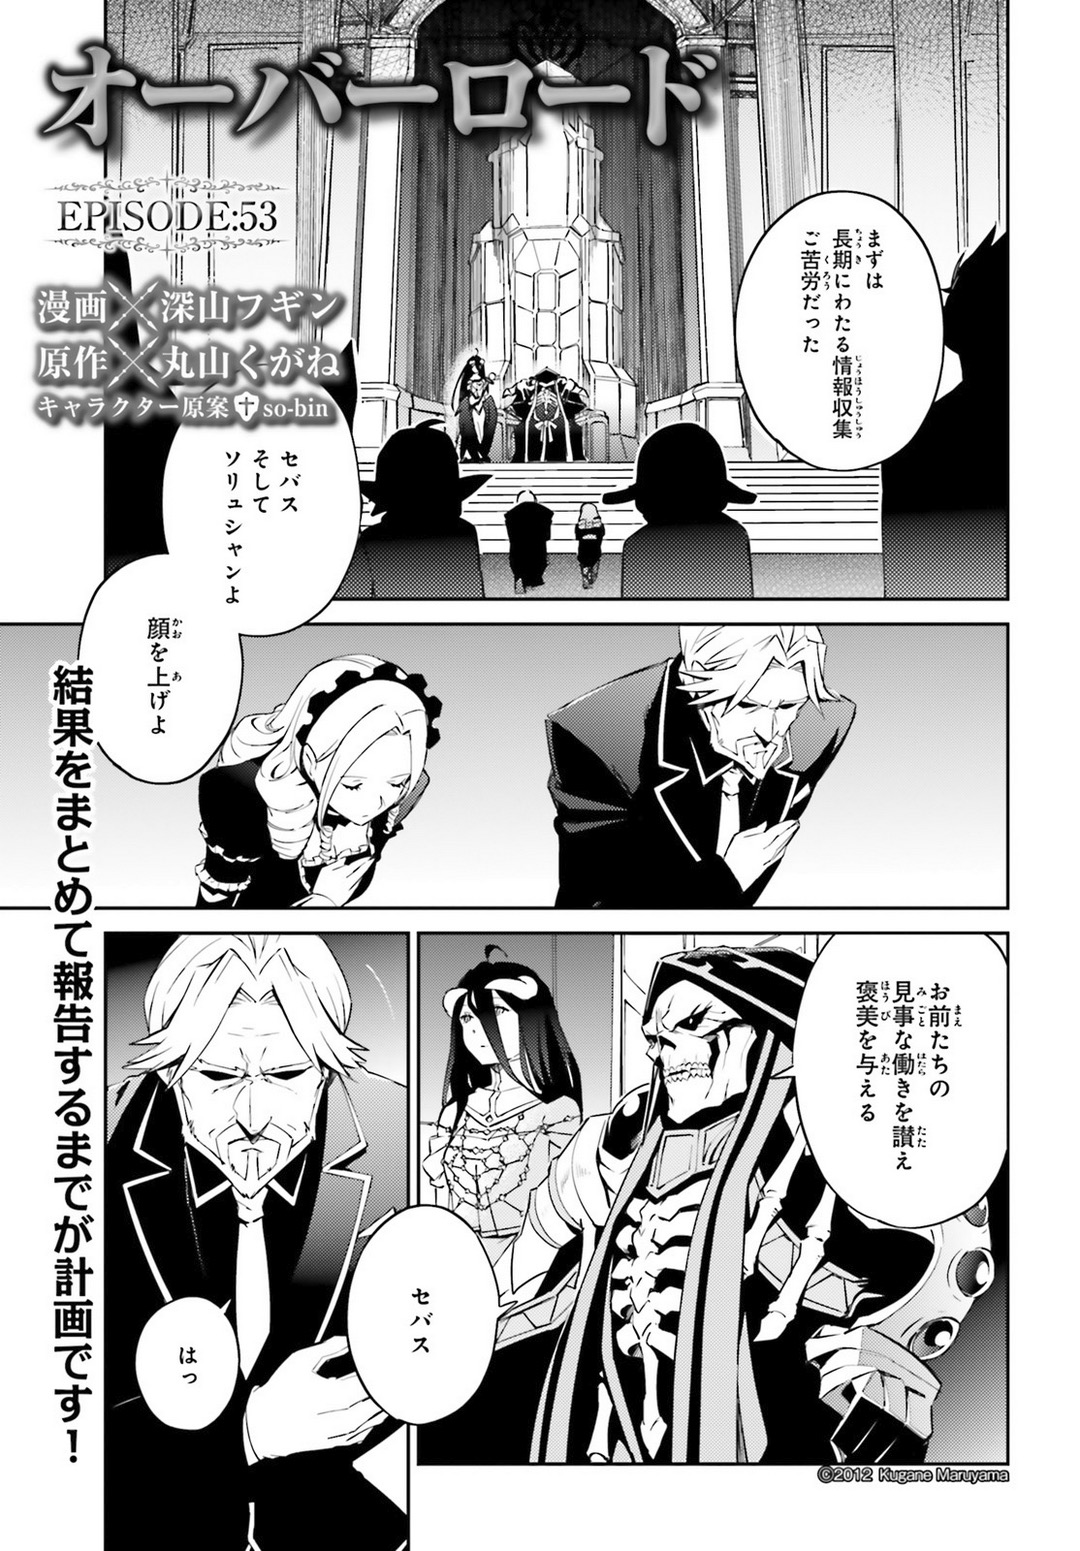 Overlord Manga Chapter 53